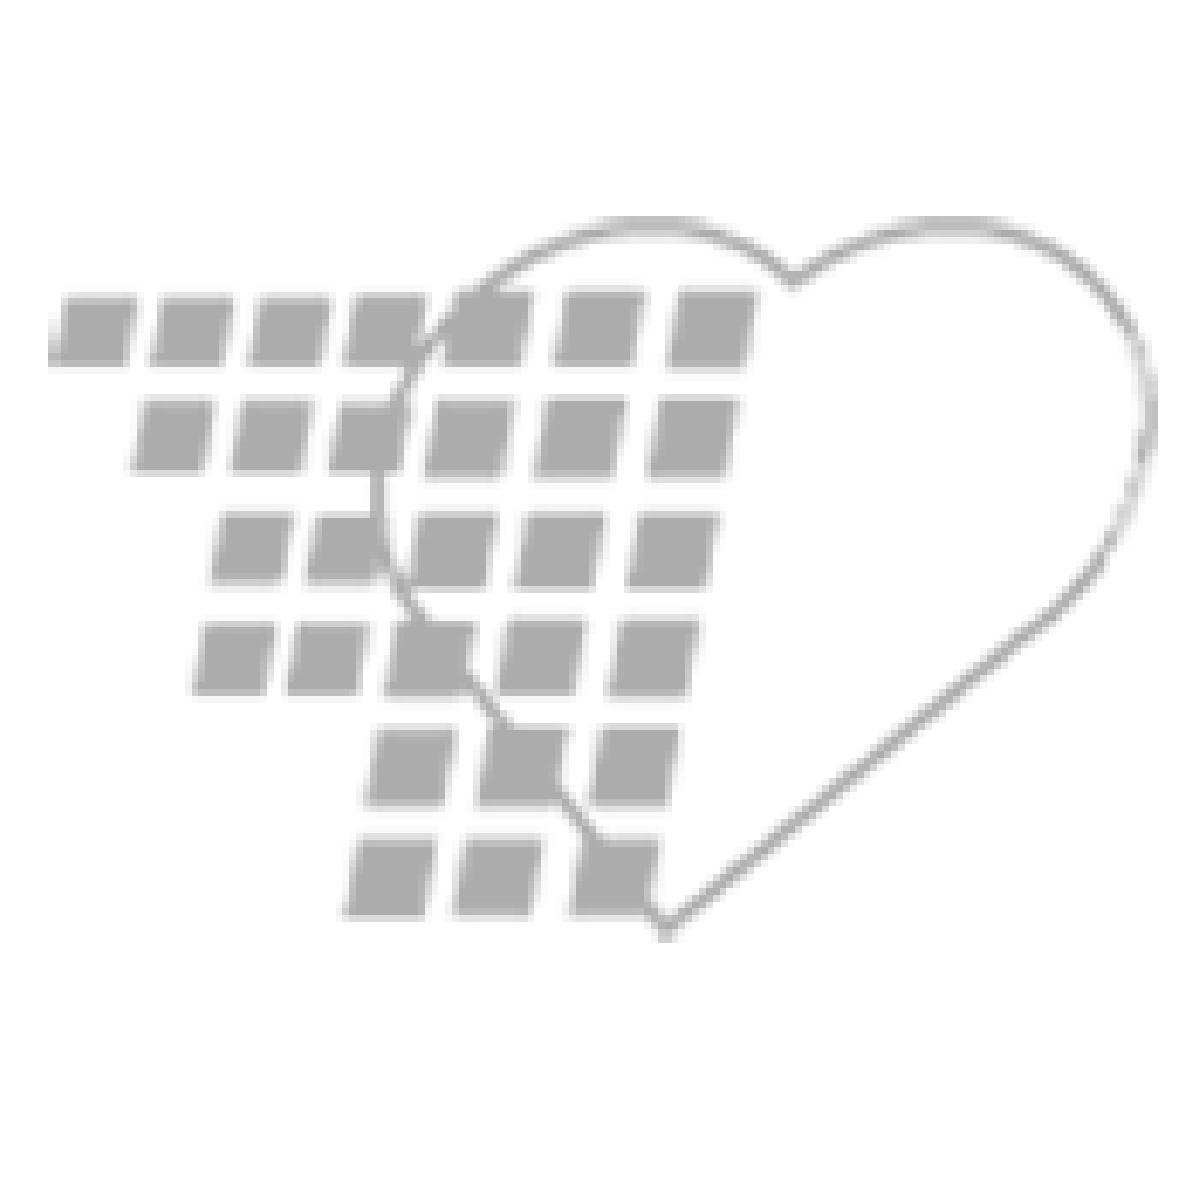 06-82-5819 BD™ Single Sterile Syringe Tip Cap